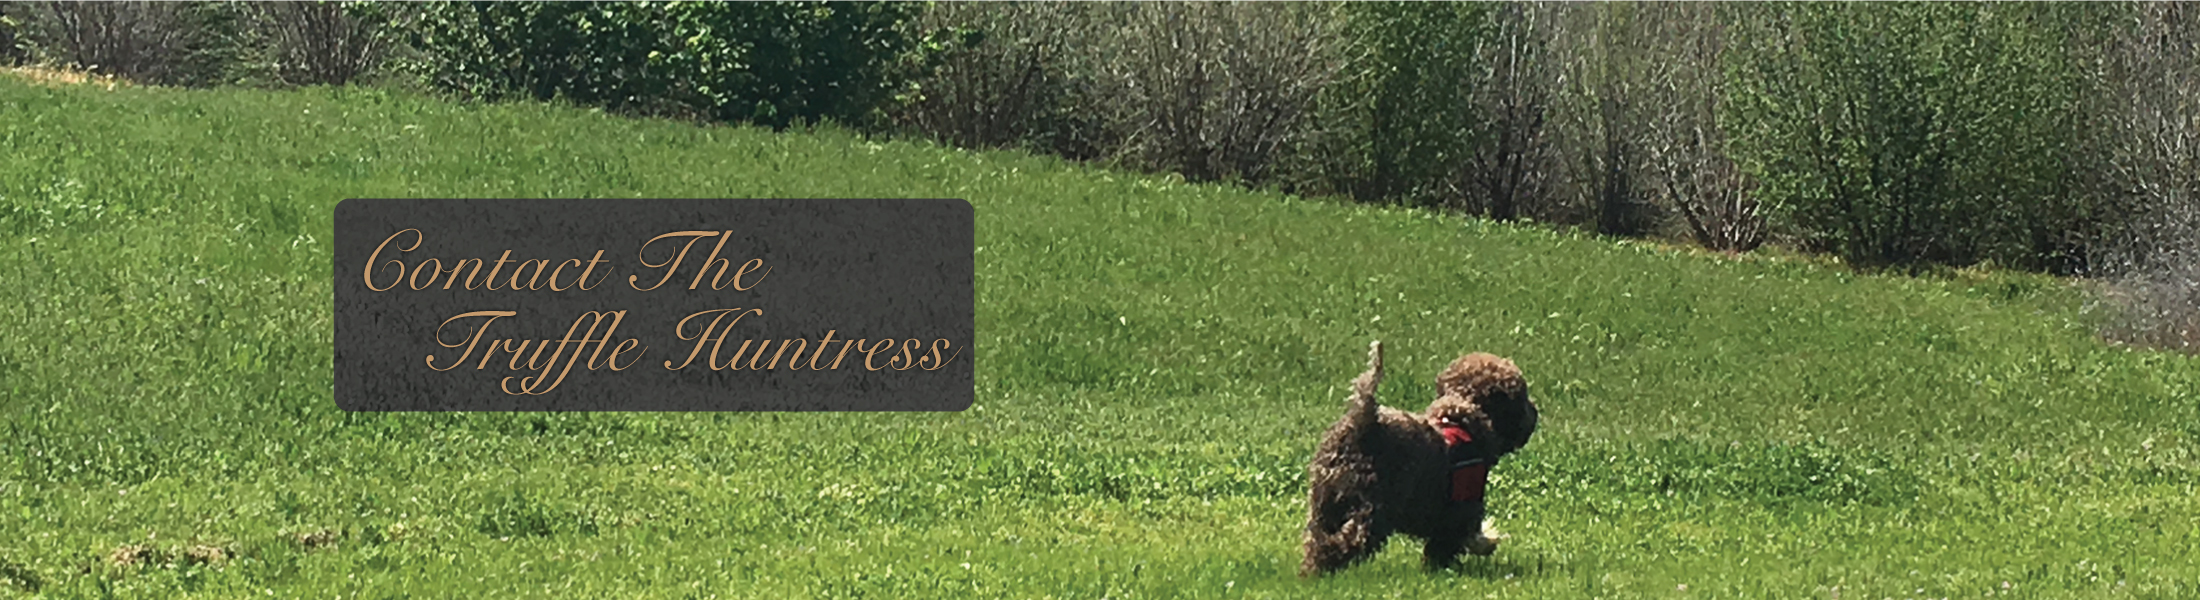 About The Truffle Huntress